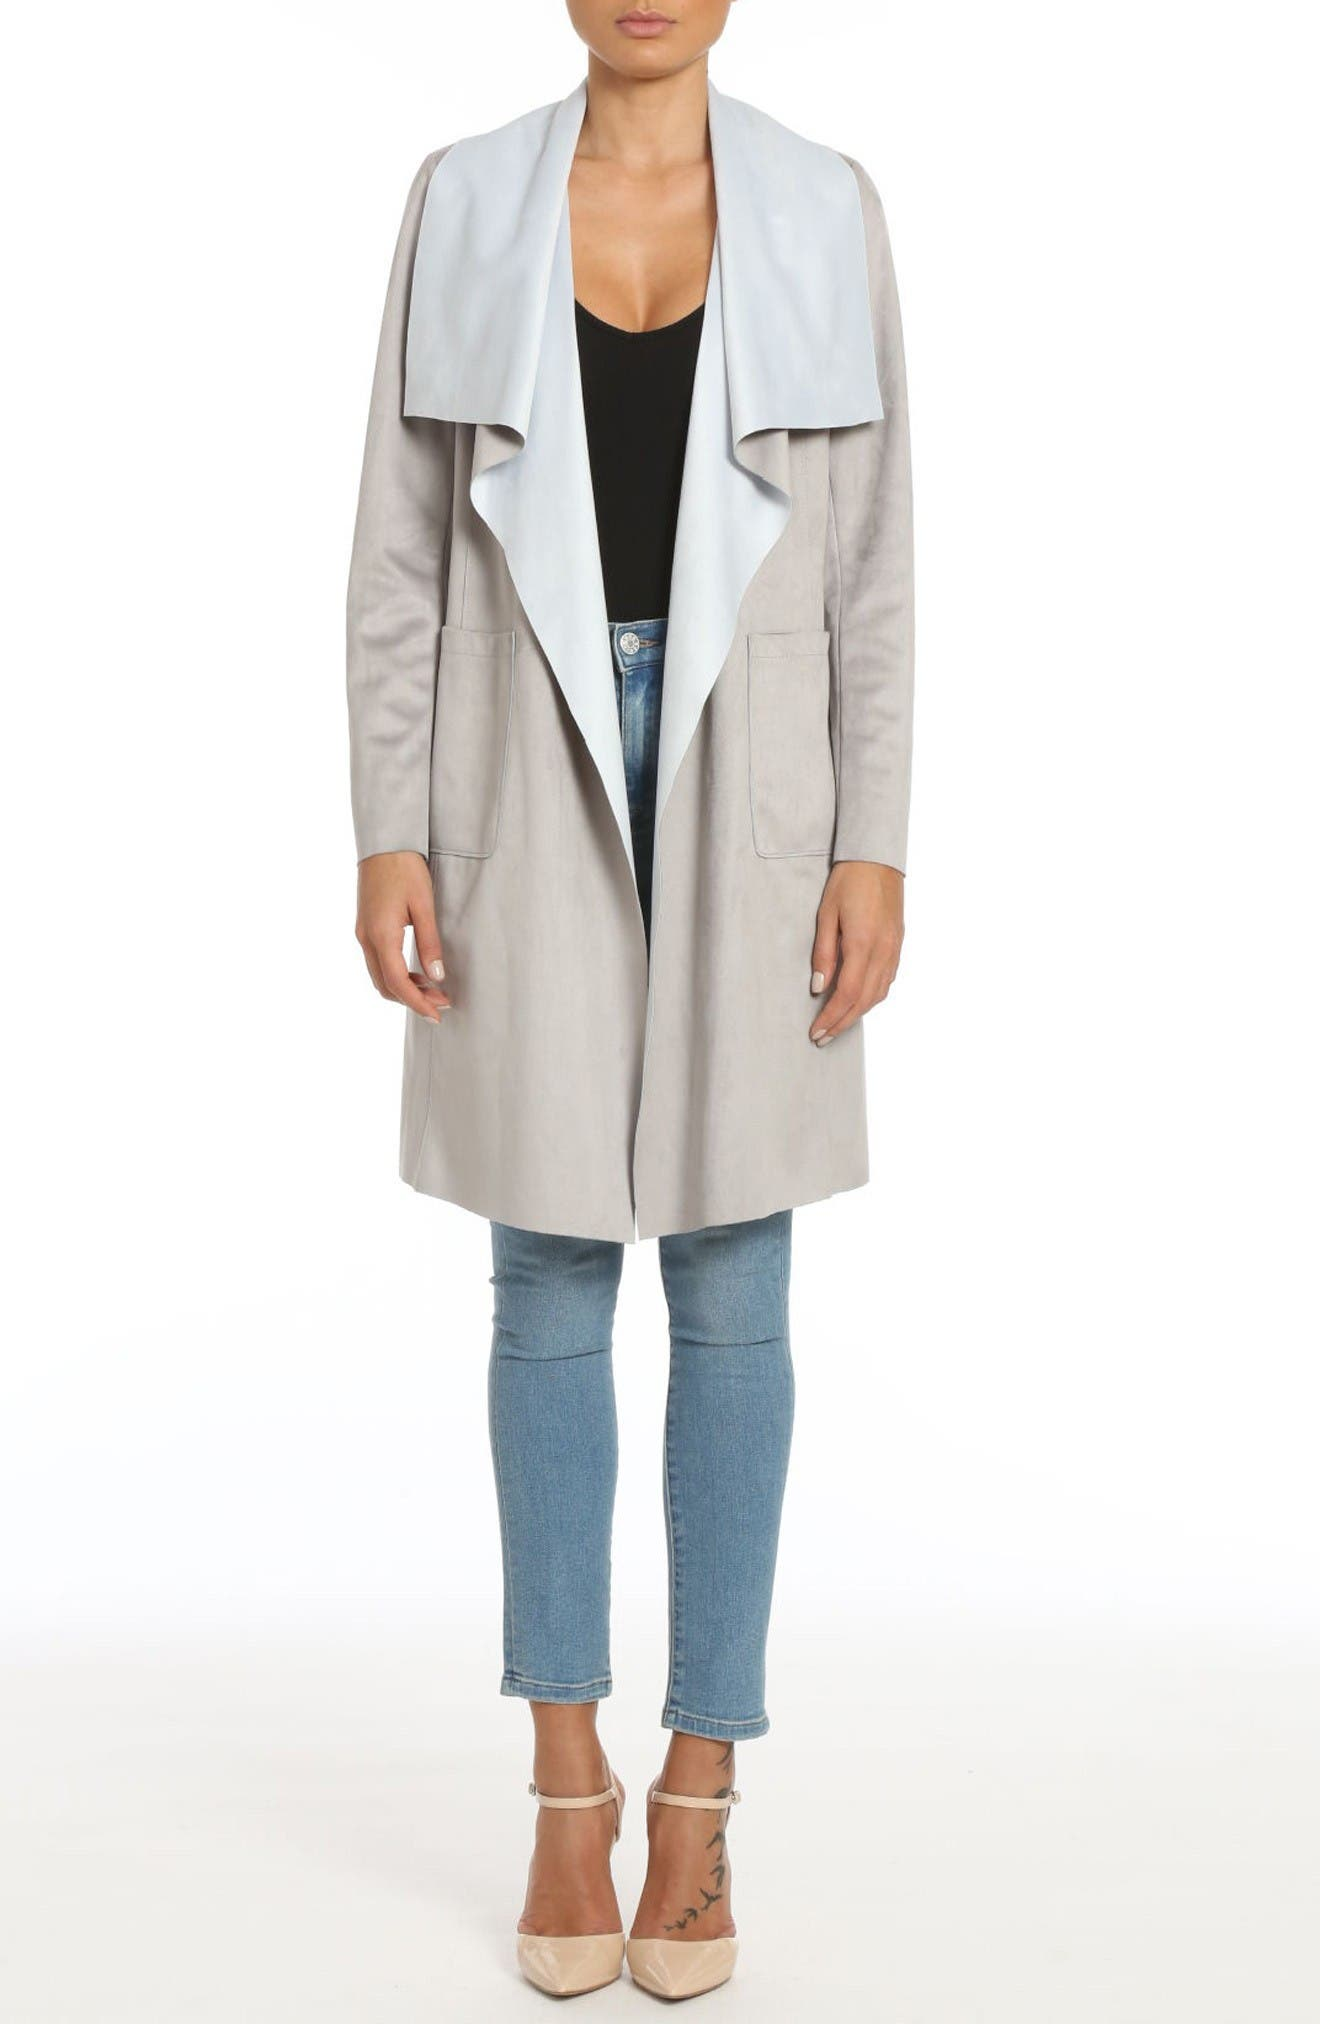 Alternate Image 1 Selected - Badgley Mischka Colorblock Faux Suede Draped Coat